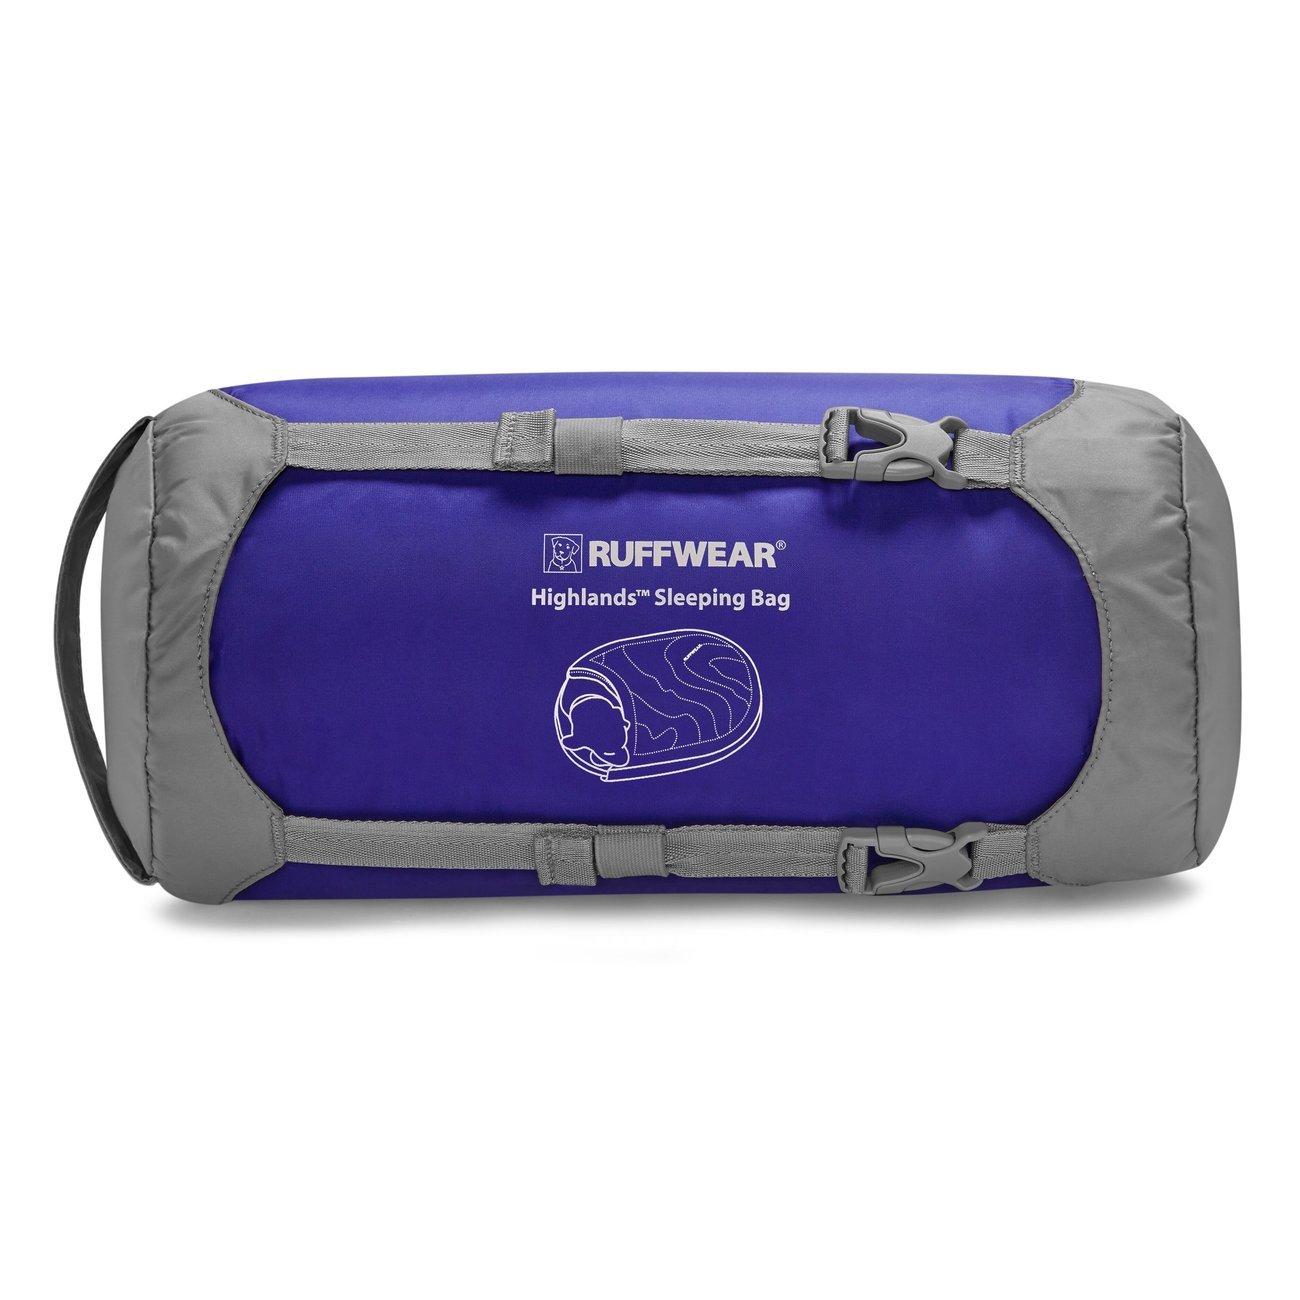 Ruffwear Highlands Sleeping Bag™ Schlafsack für Hunde, Bild 11